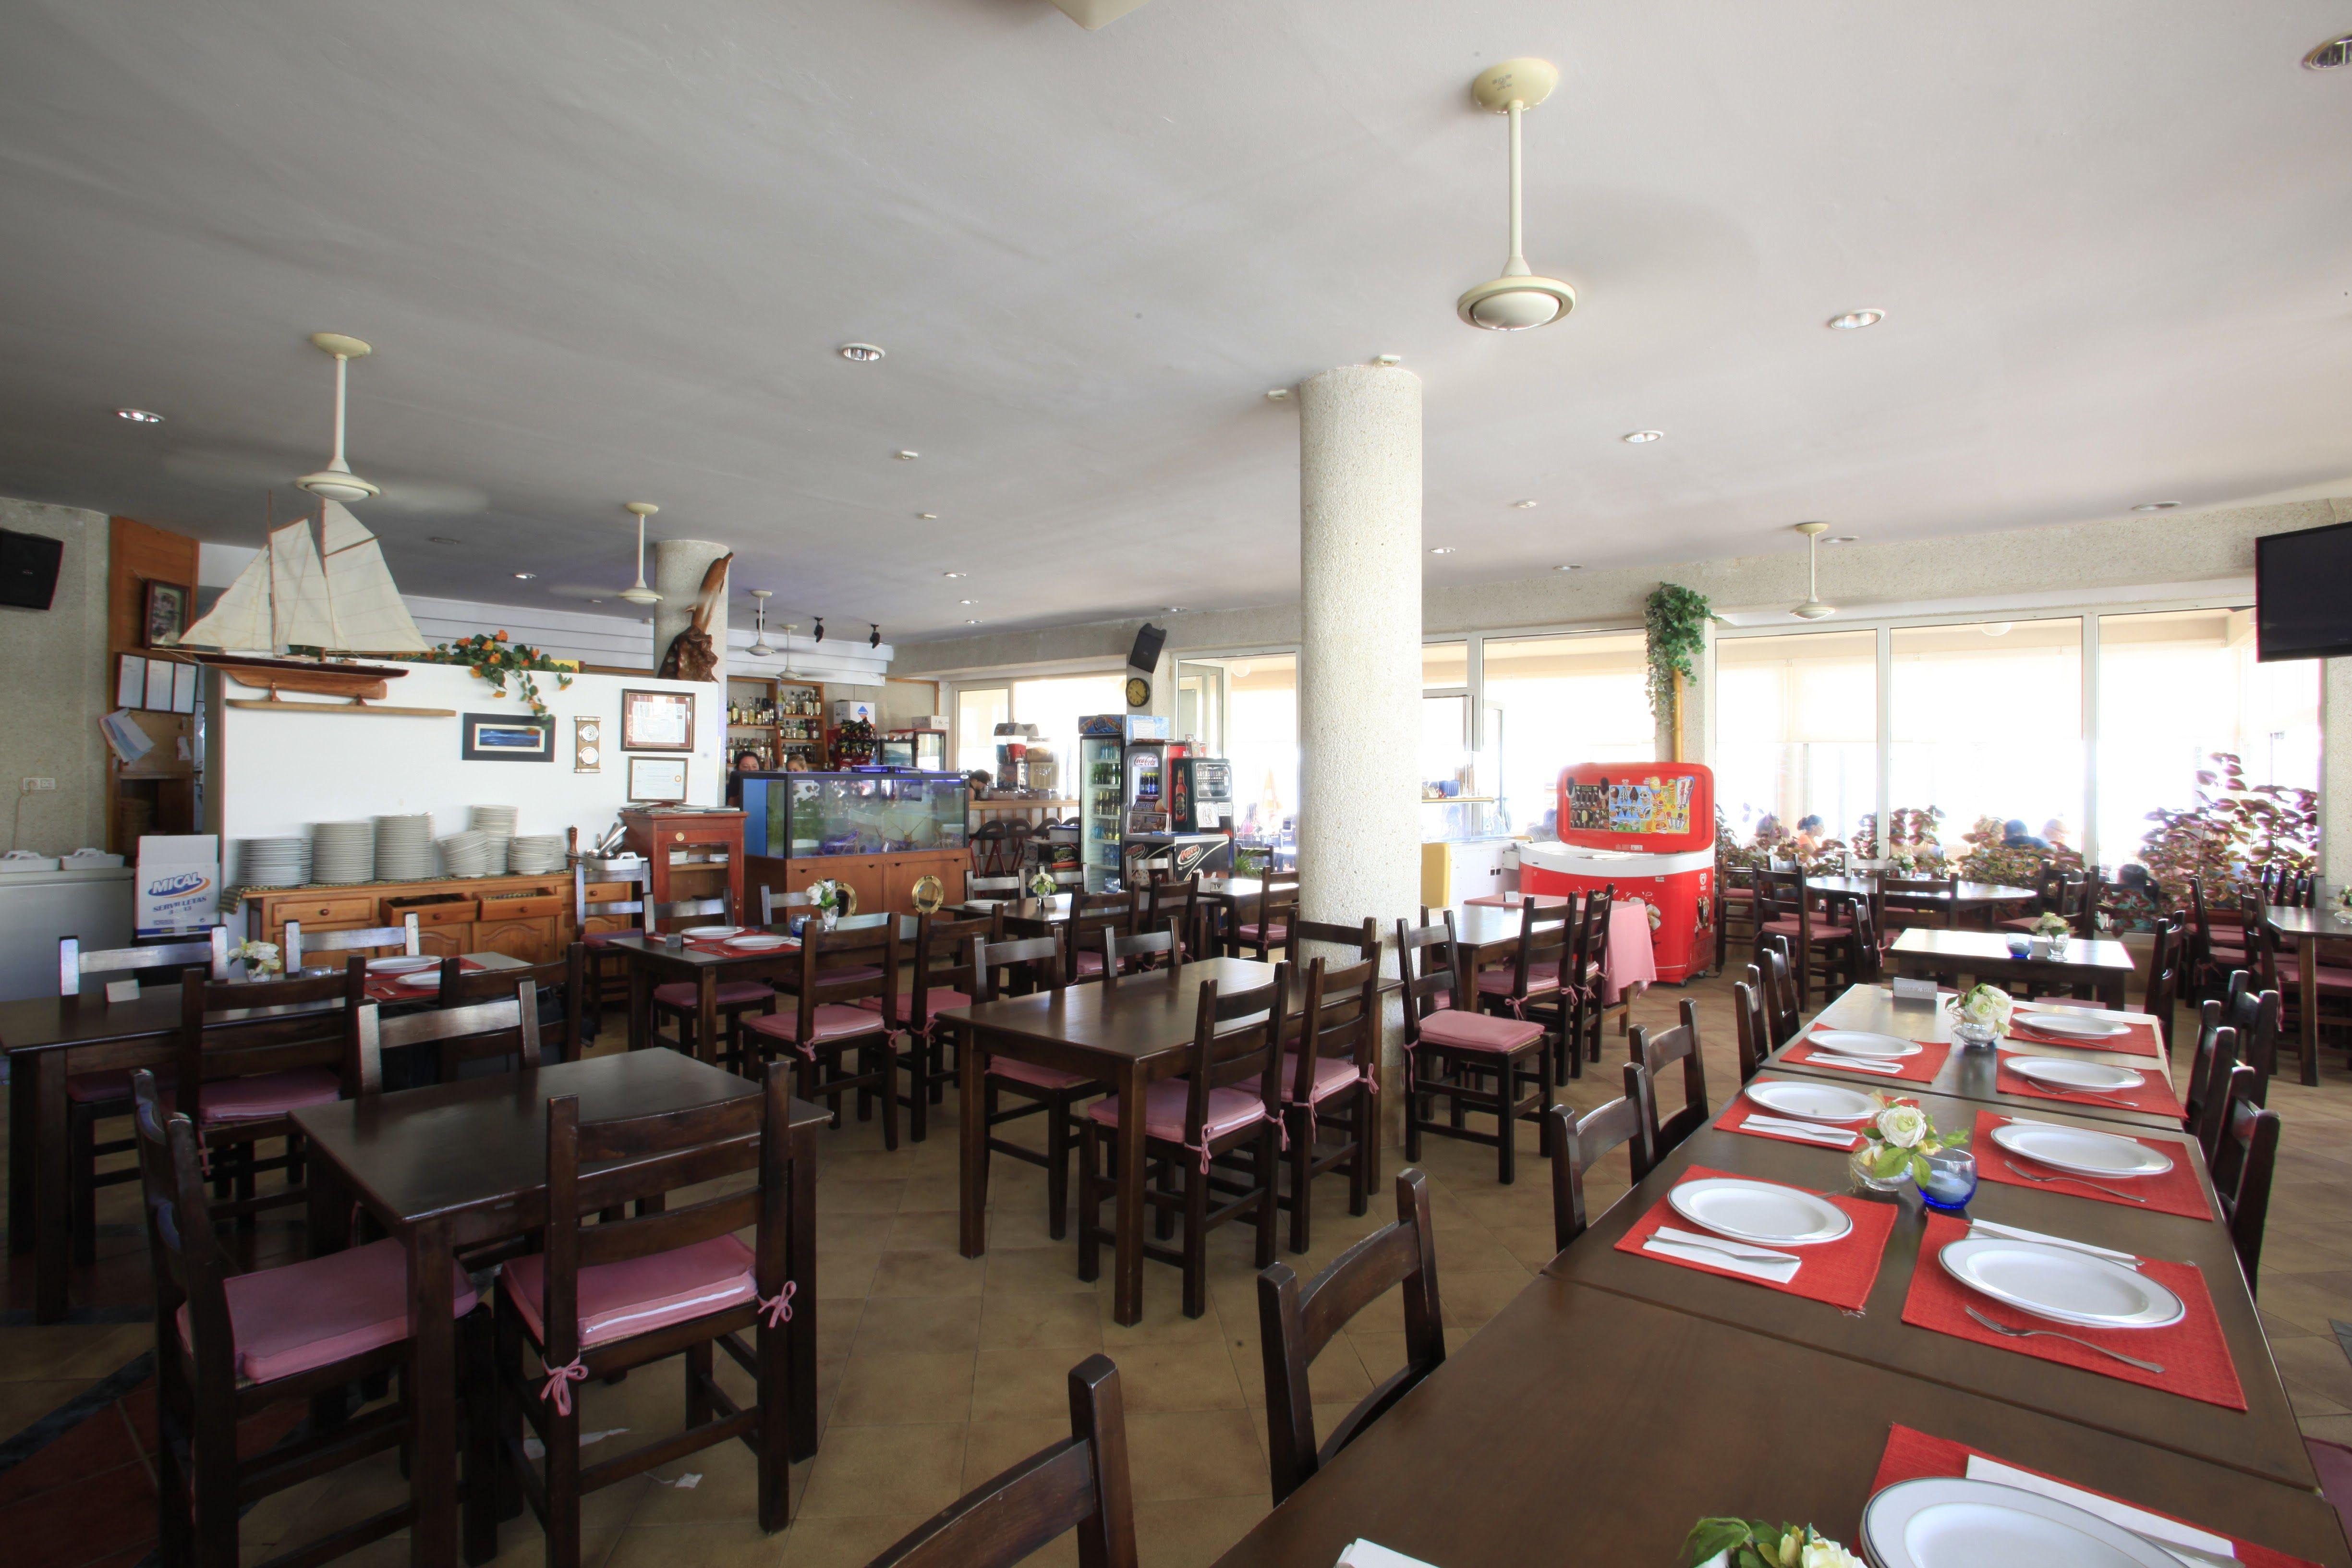 Foto 6 de Restaurante en Sant Antoni de Portmany   Restaurante Sa Punta D'es Moli